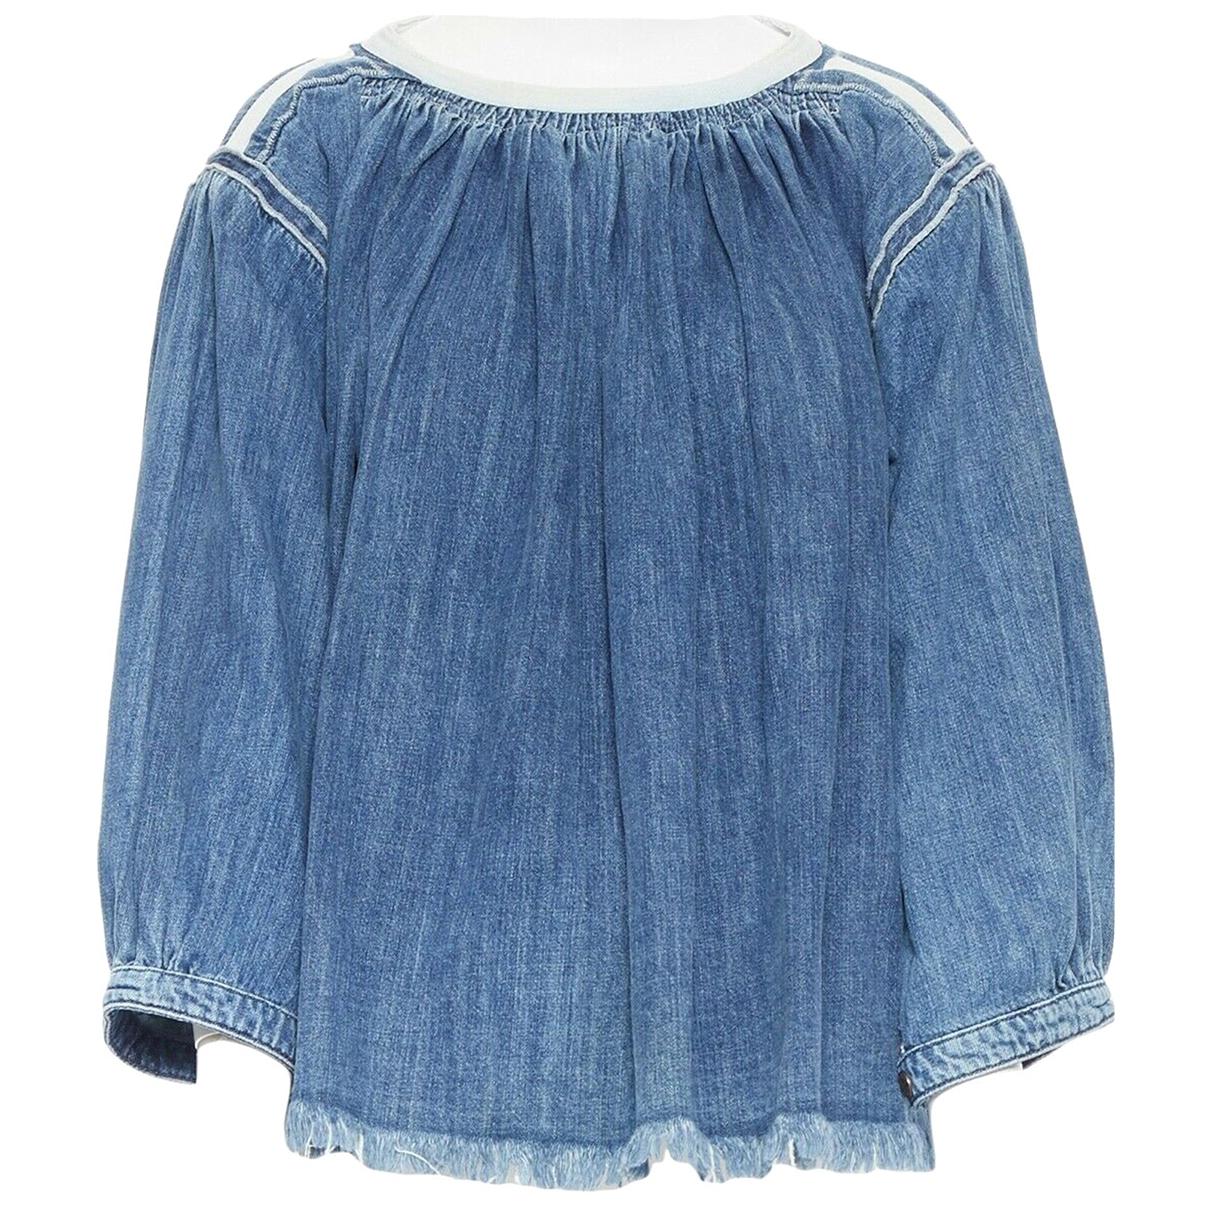 Chloé \N Blue Denim - Jeans  top for Women 36 FR